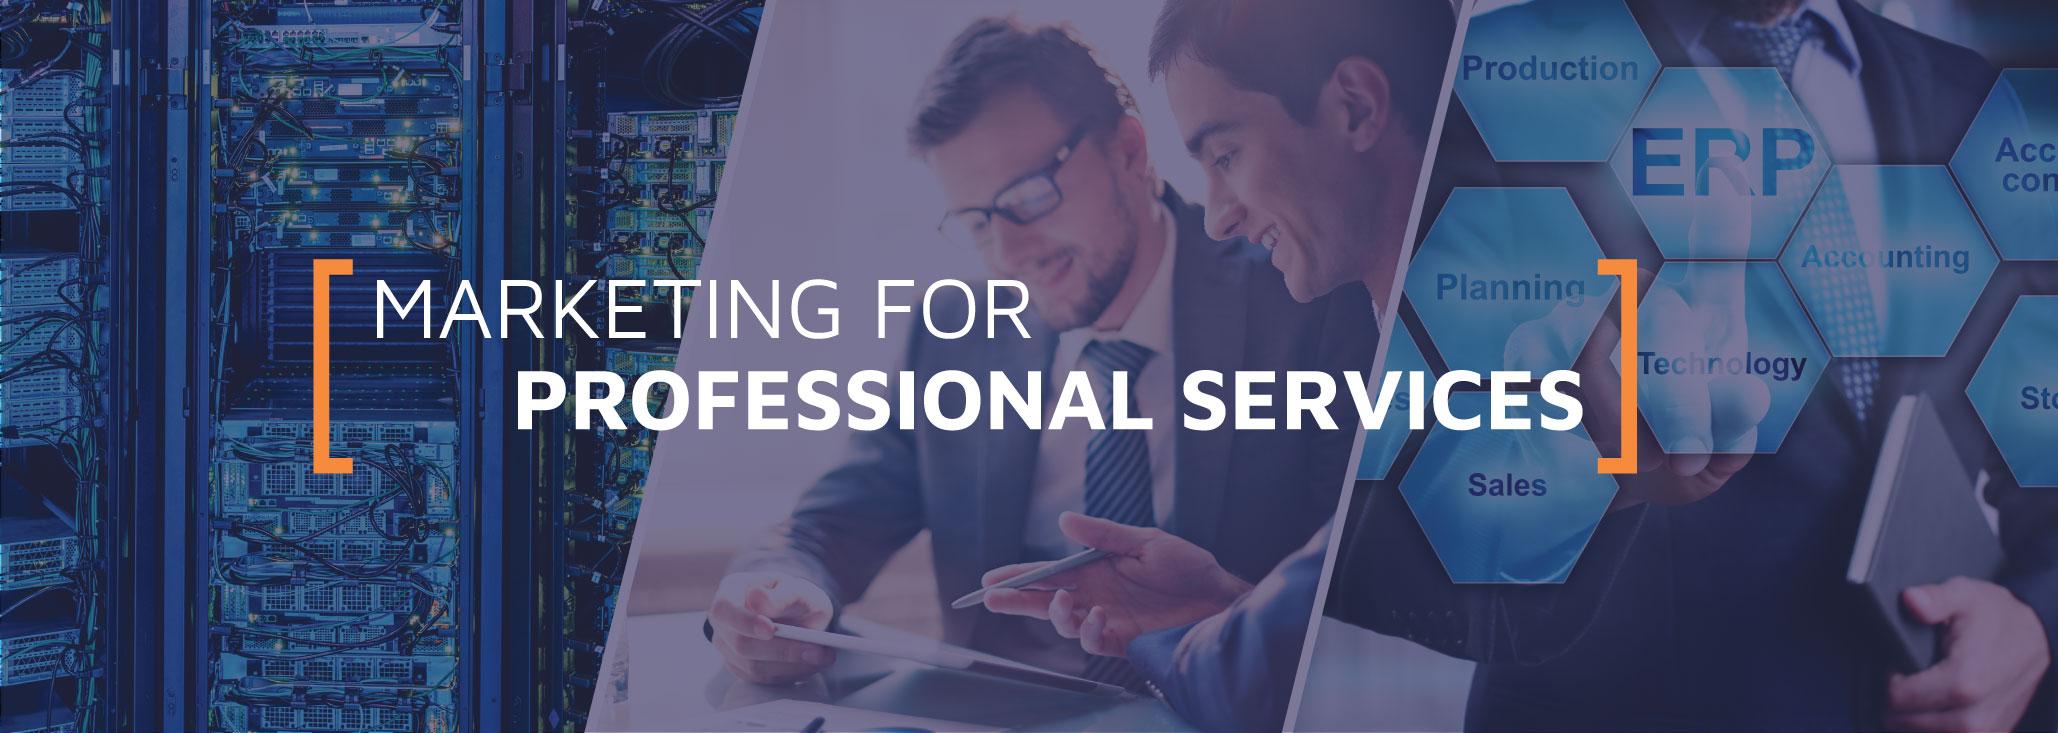 ProfessionalServicesVert-1